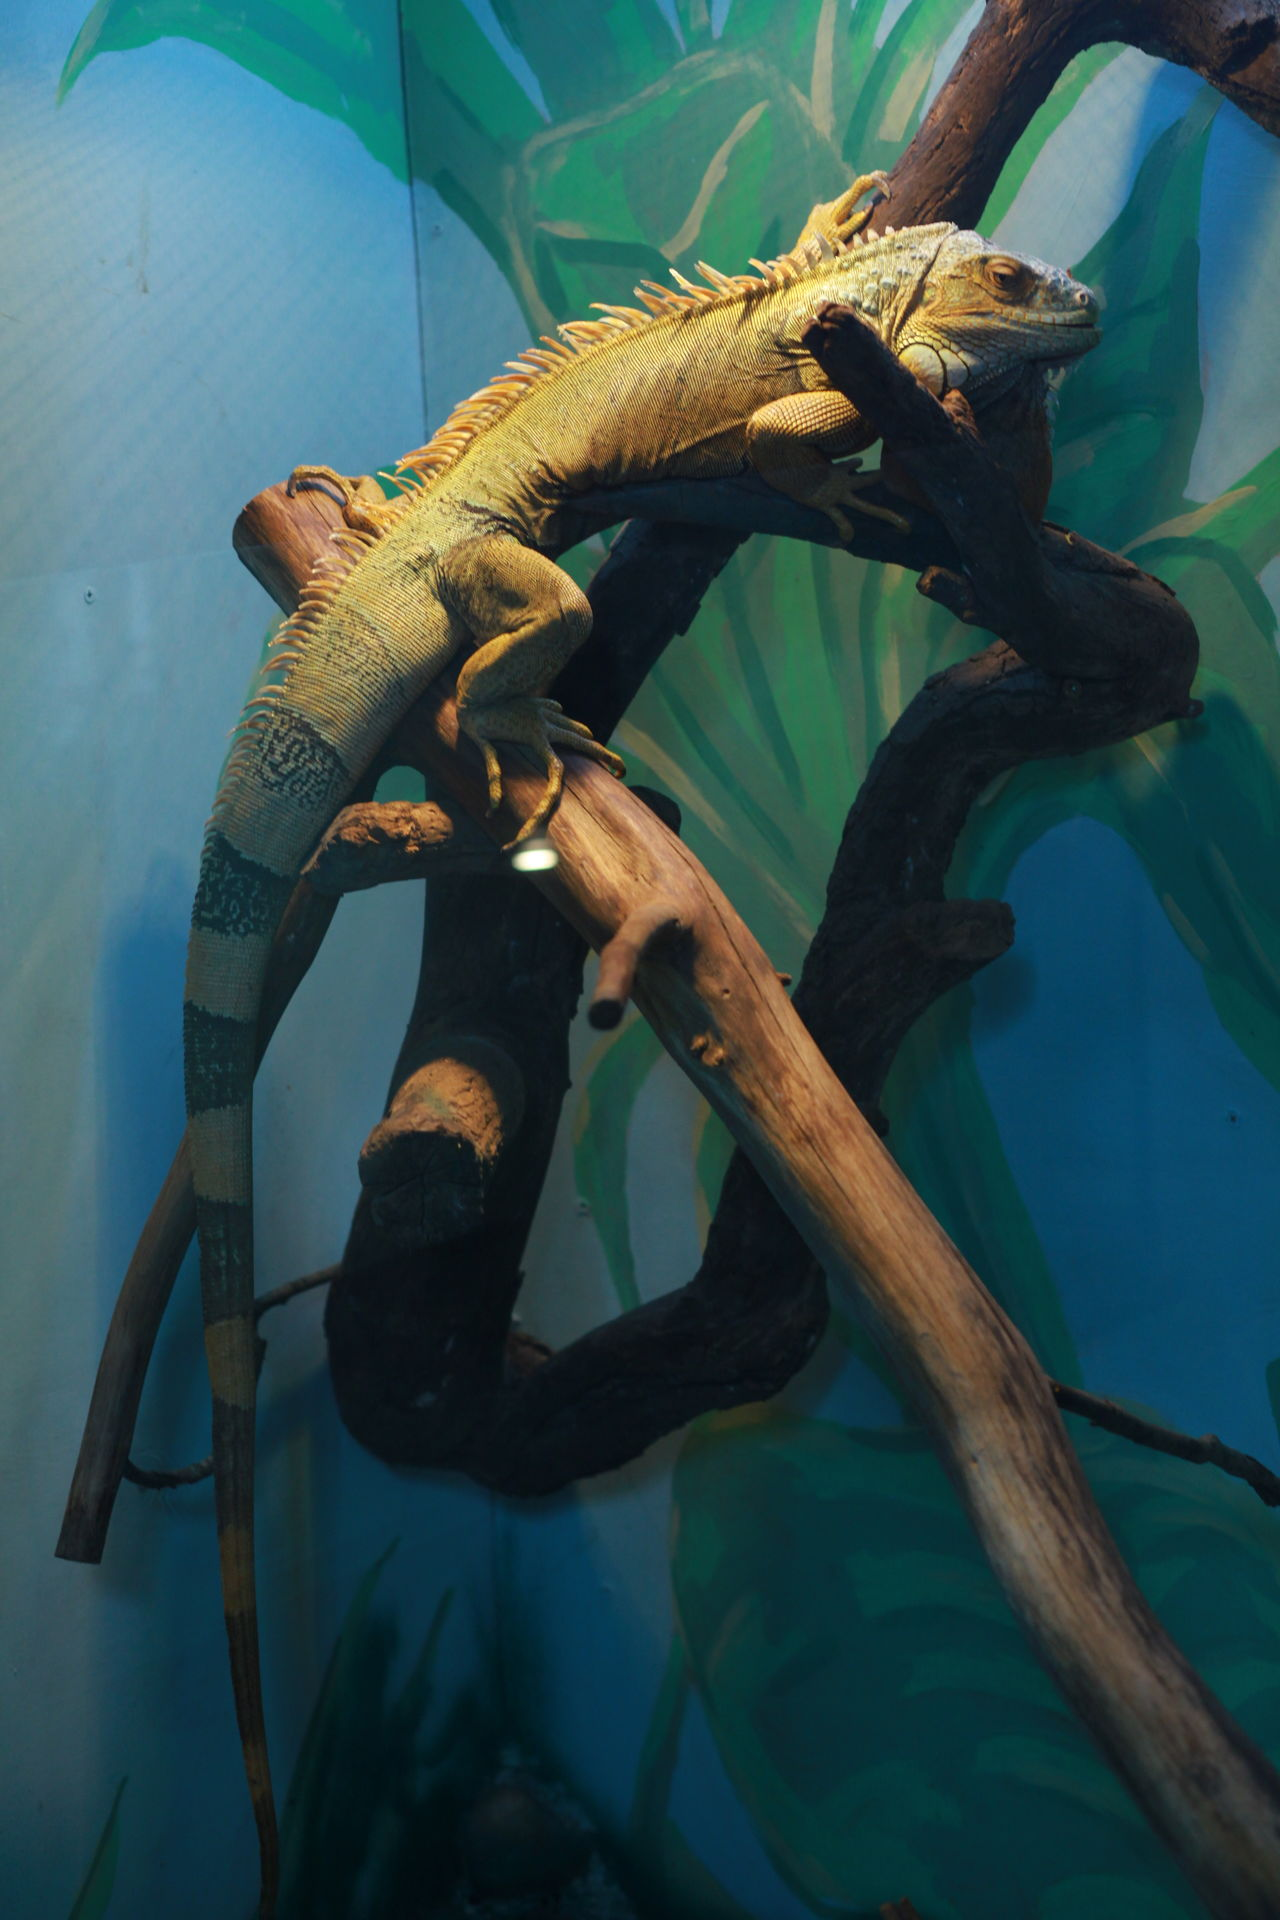 Animal Themes Captive Animals Captivity Day Iguana No People One Animal Reptile Reptile Reptile Photography Reptile World Reptiles Zoo